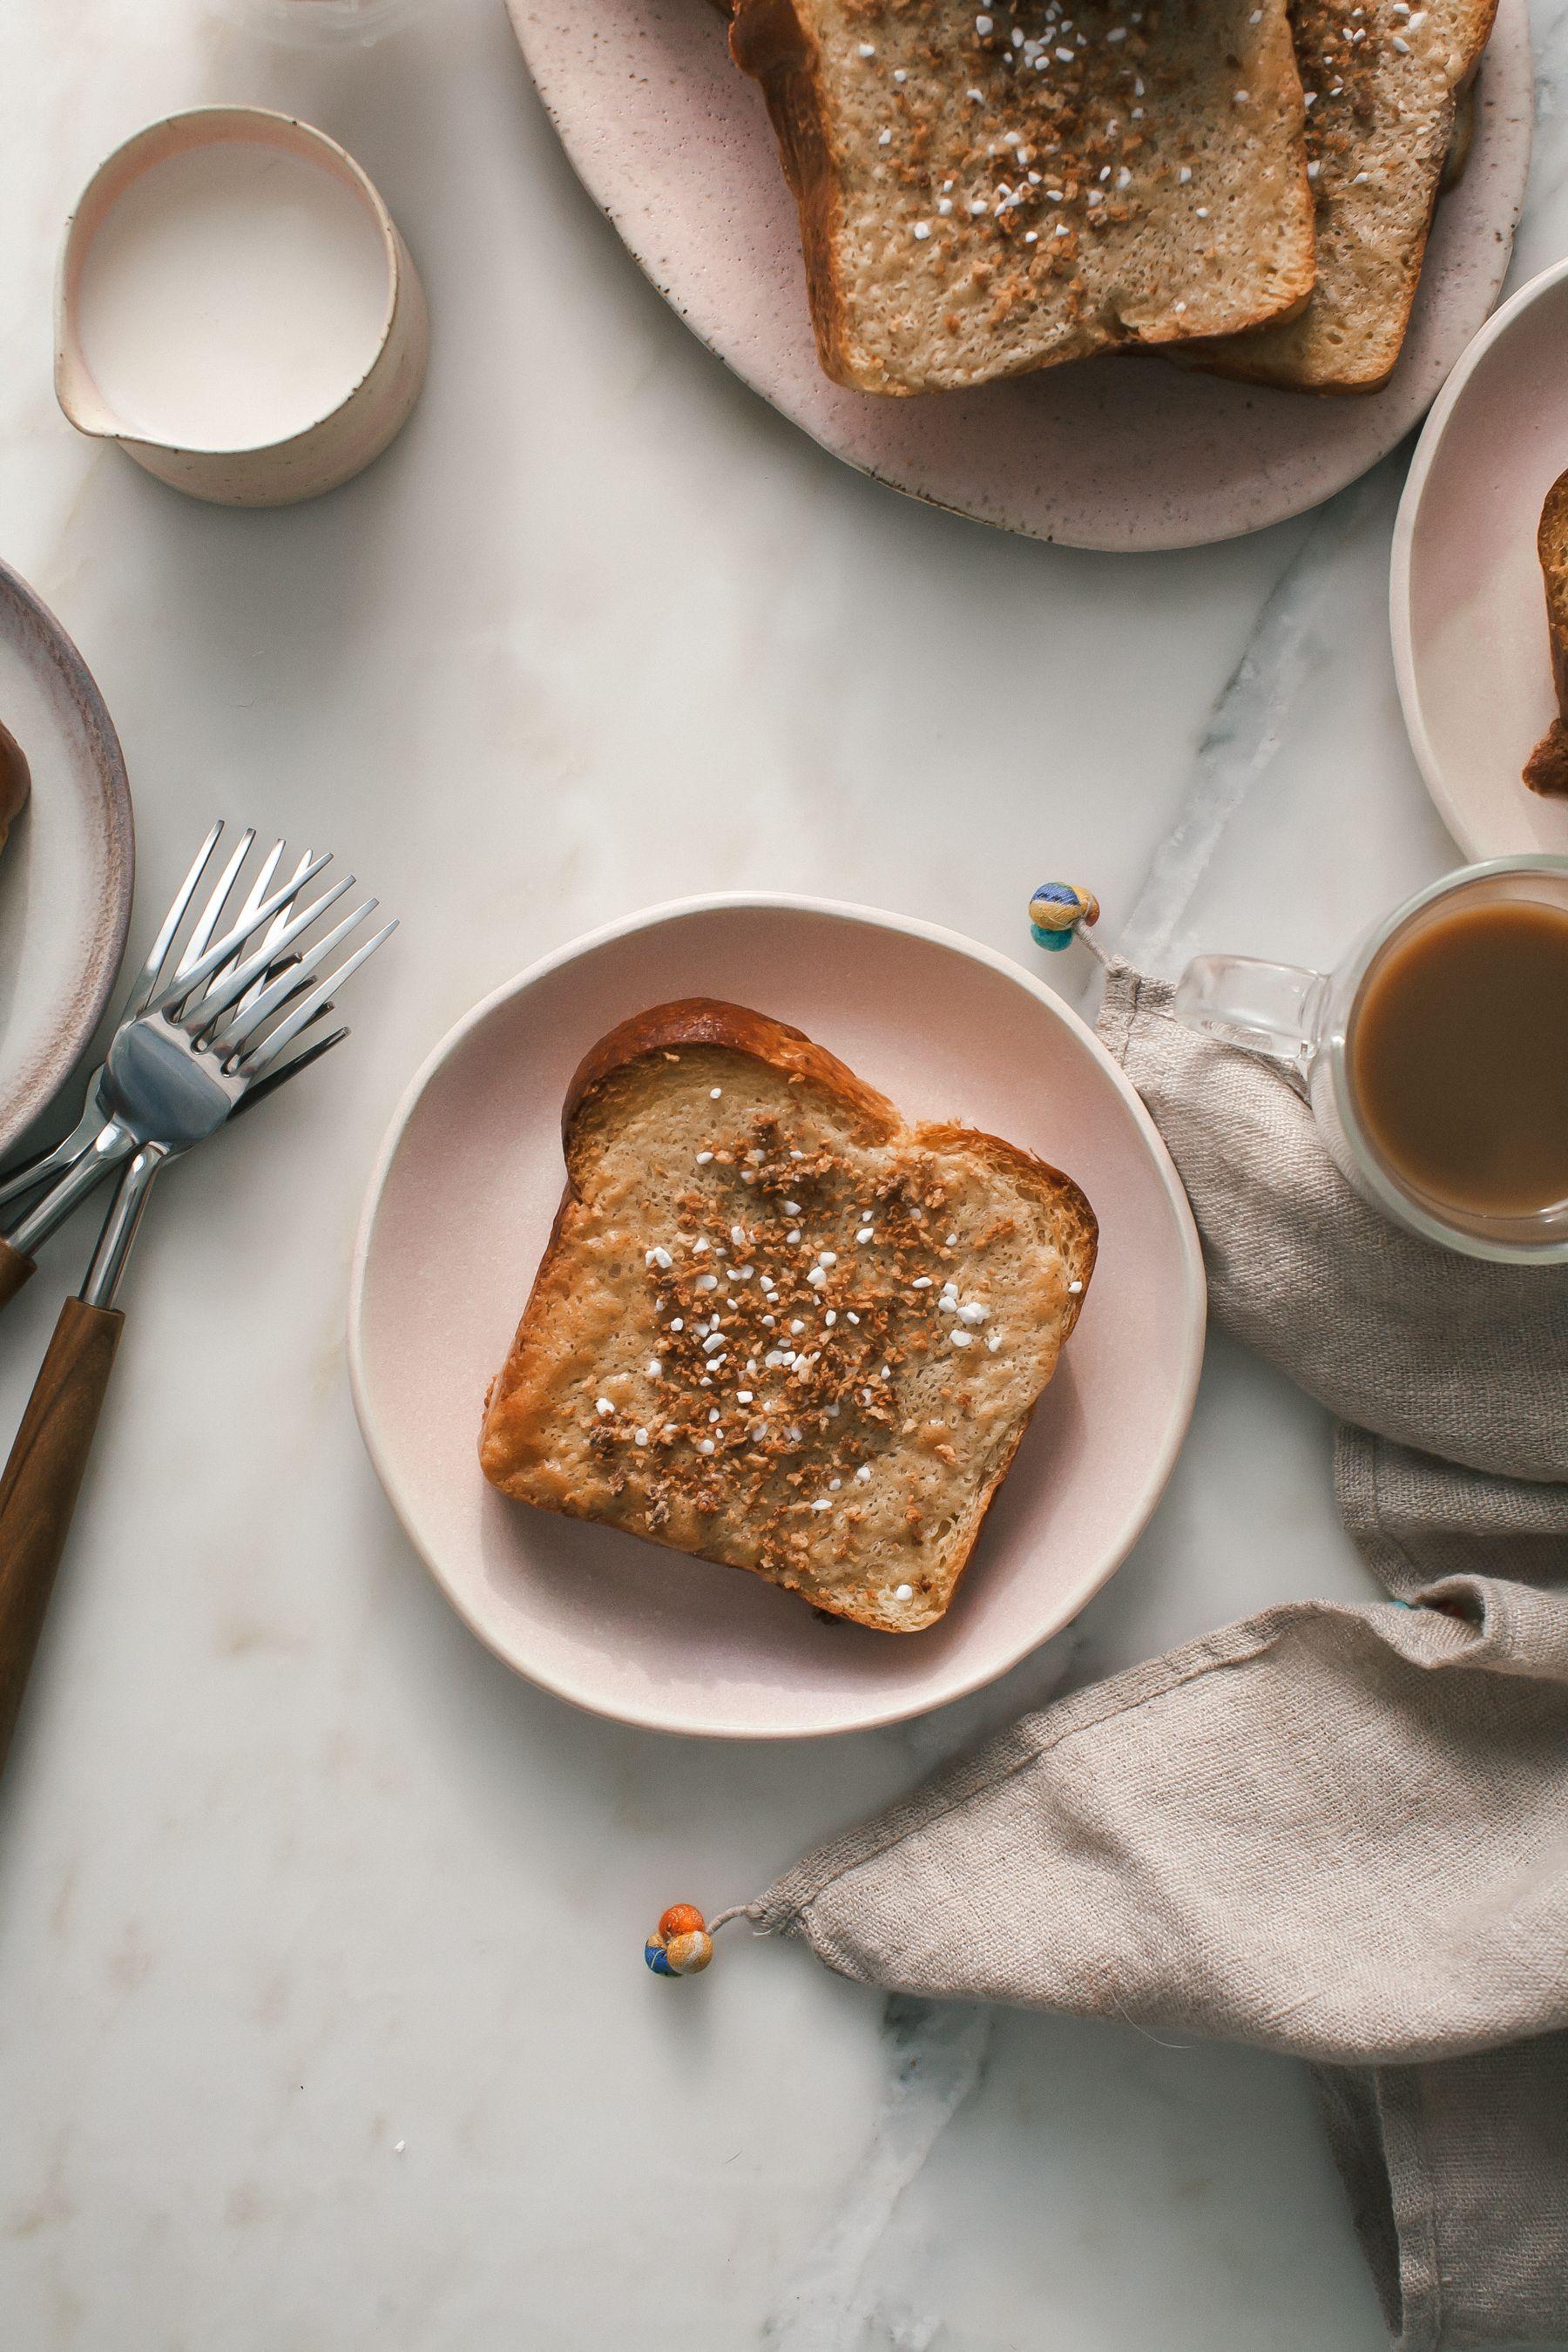 Gigantic Cinnamon Toast Crunch - A Cozy Kitchen